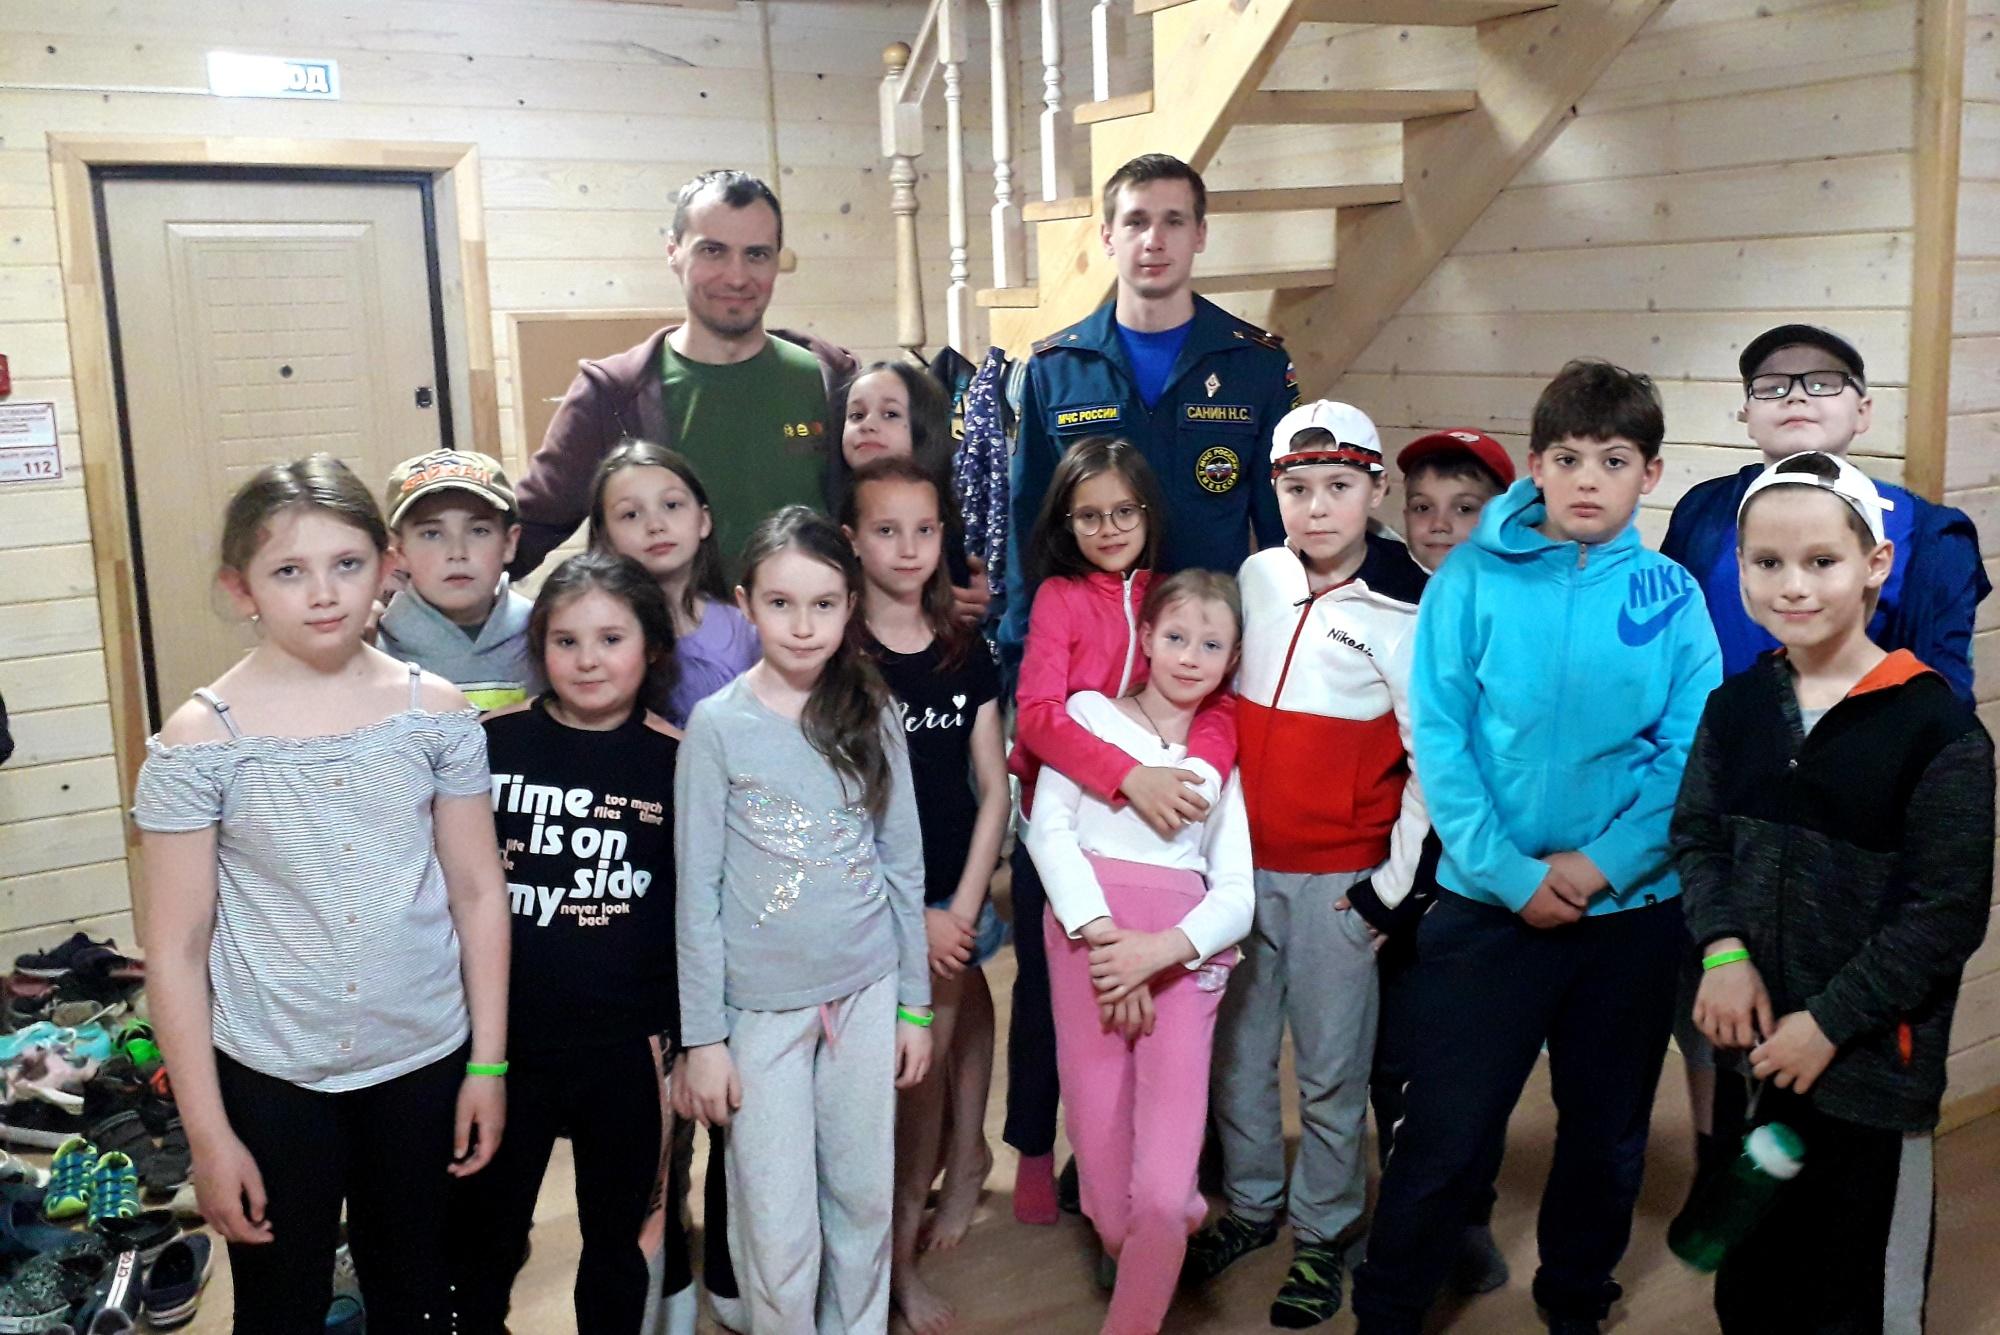 Занятия по безопасности провели сотрудники МЧС России в ДОЛ «Терра-Ностра»